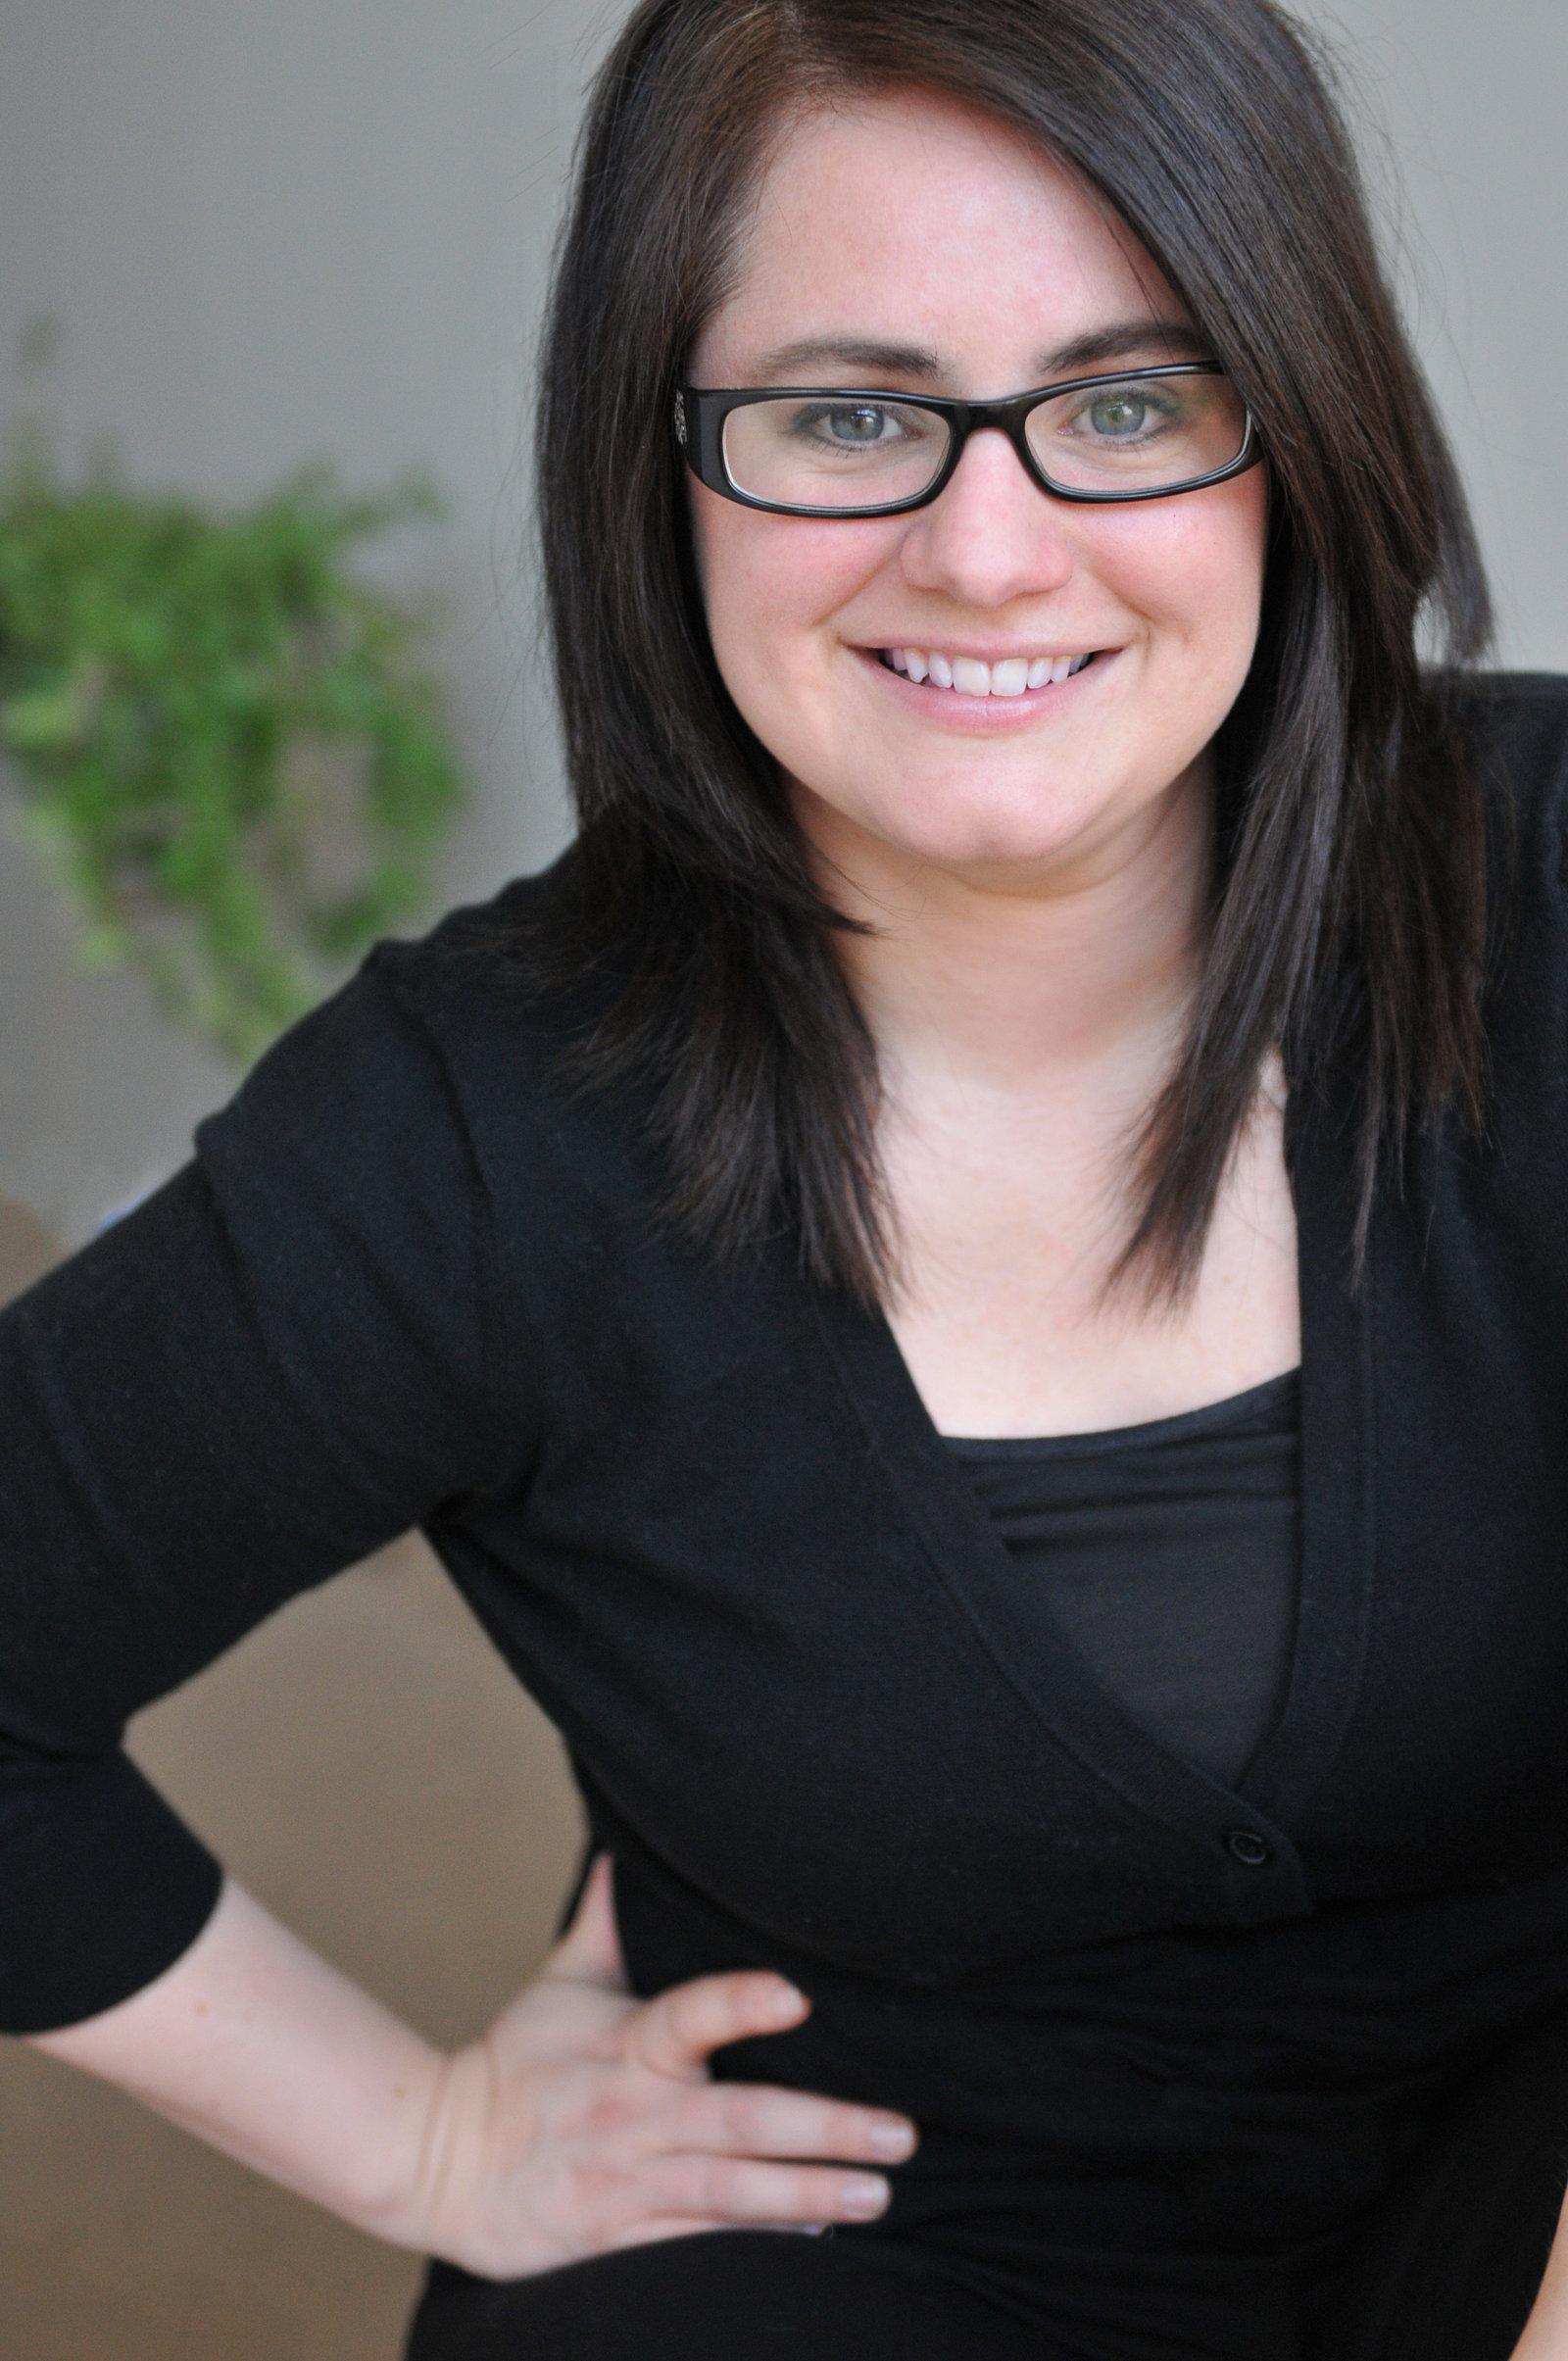 Jeannine at Markland Design Headshot by Melissa E Earle